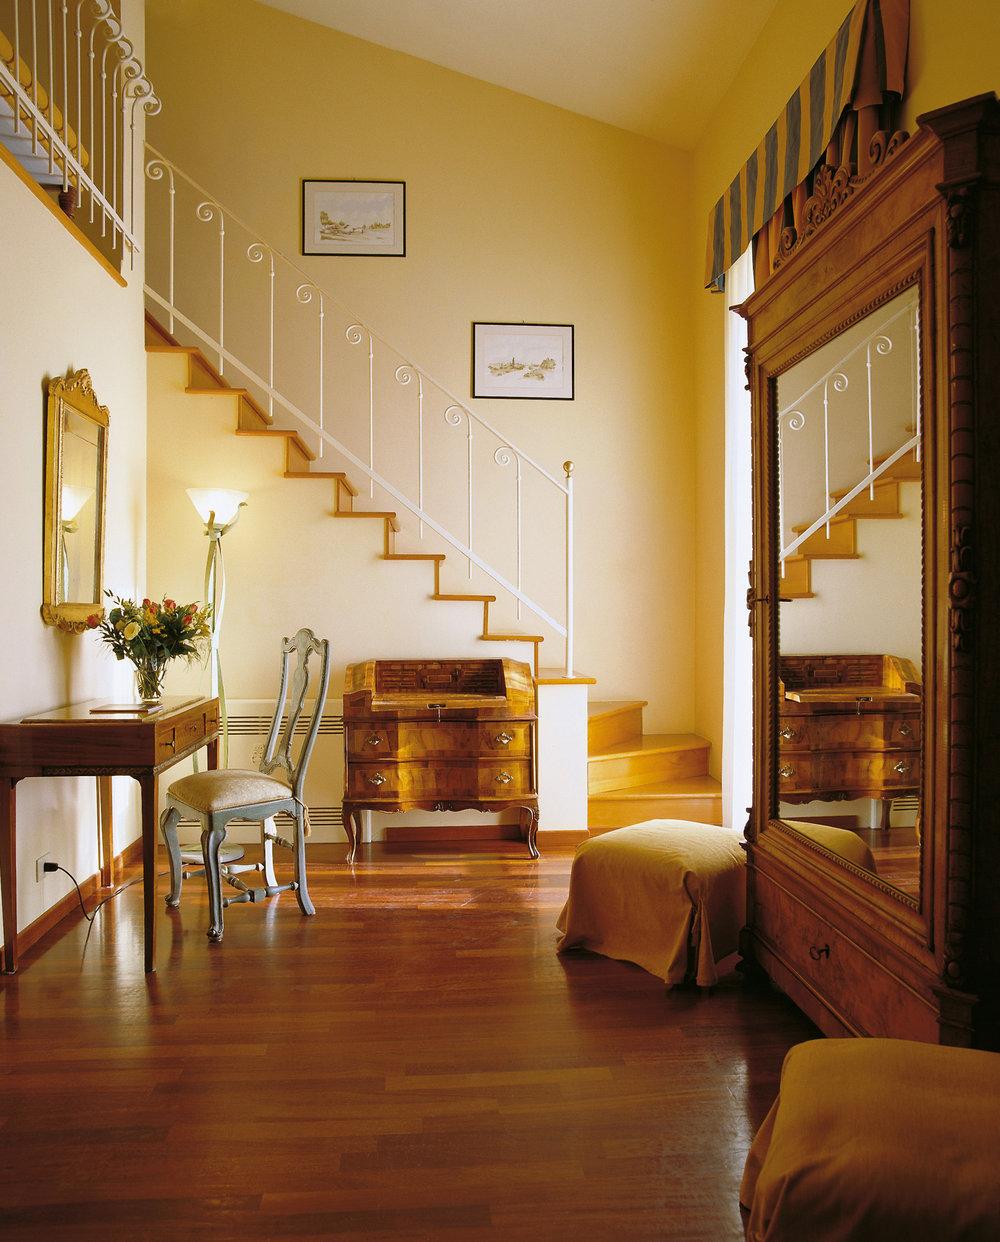 8891264_39_hotel_versilia_luxury_sul_mare.jpg